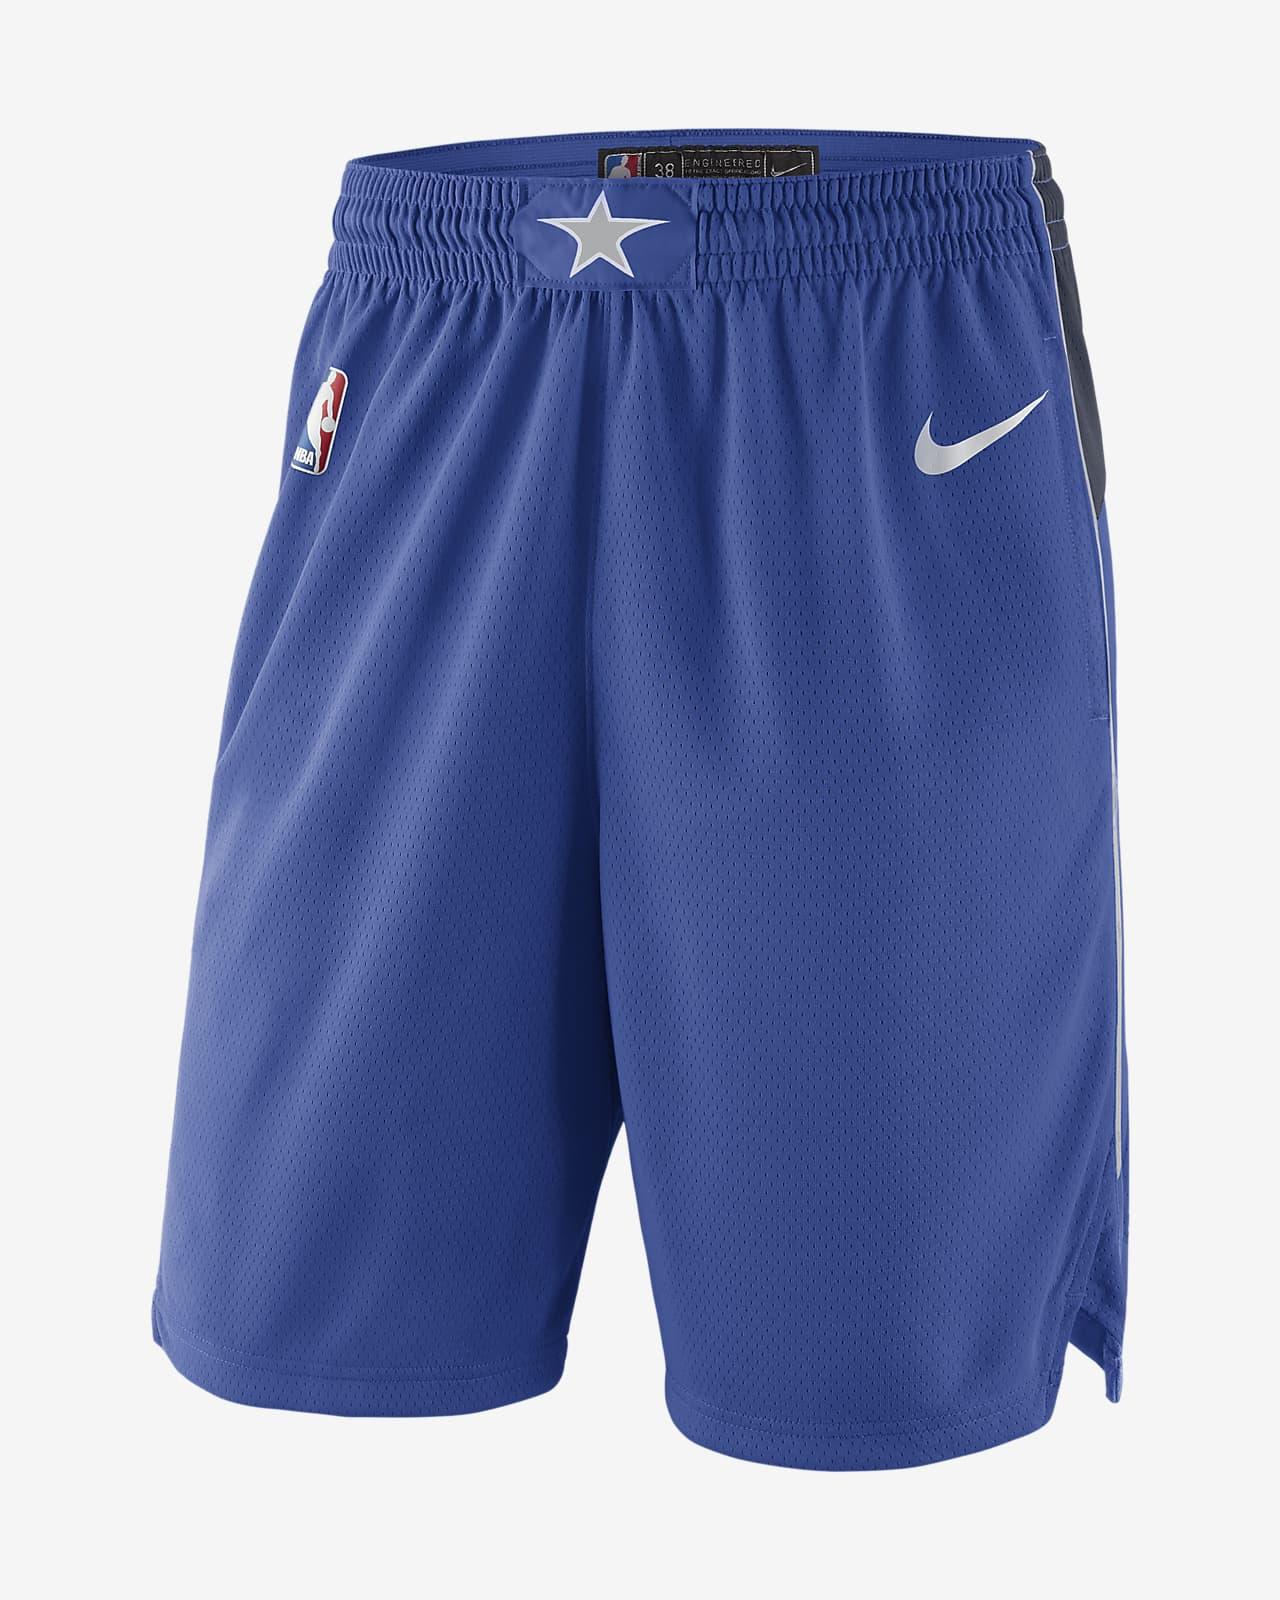 Shorts Dallas Mavericks Icon Edition Swingman Nike NBA - Uomo